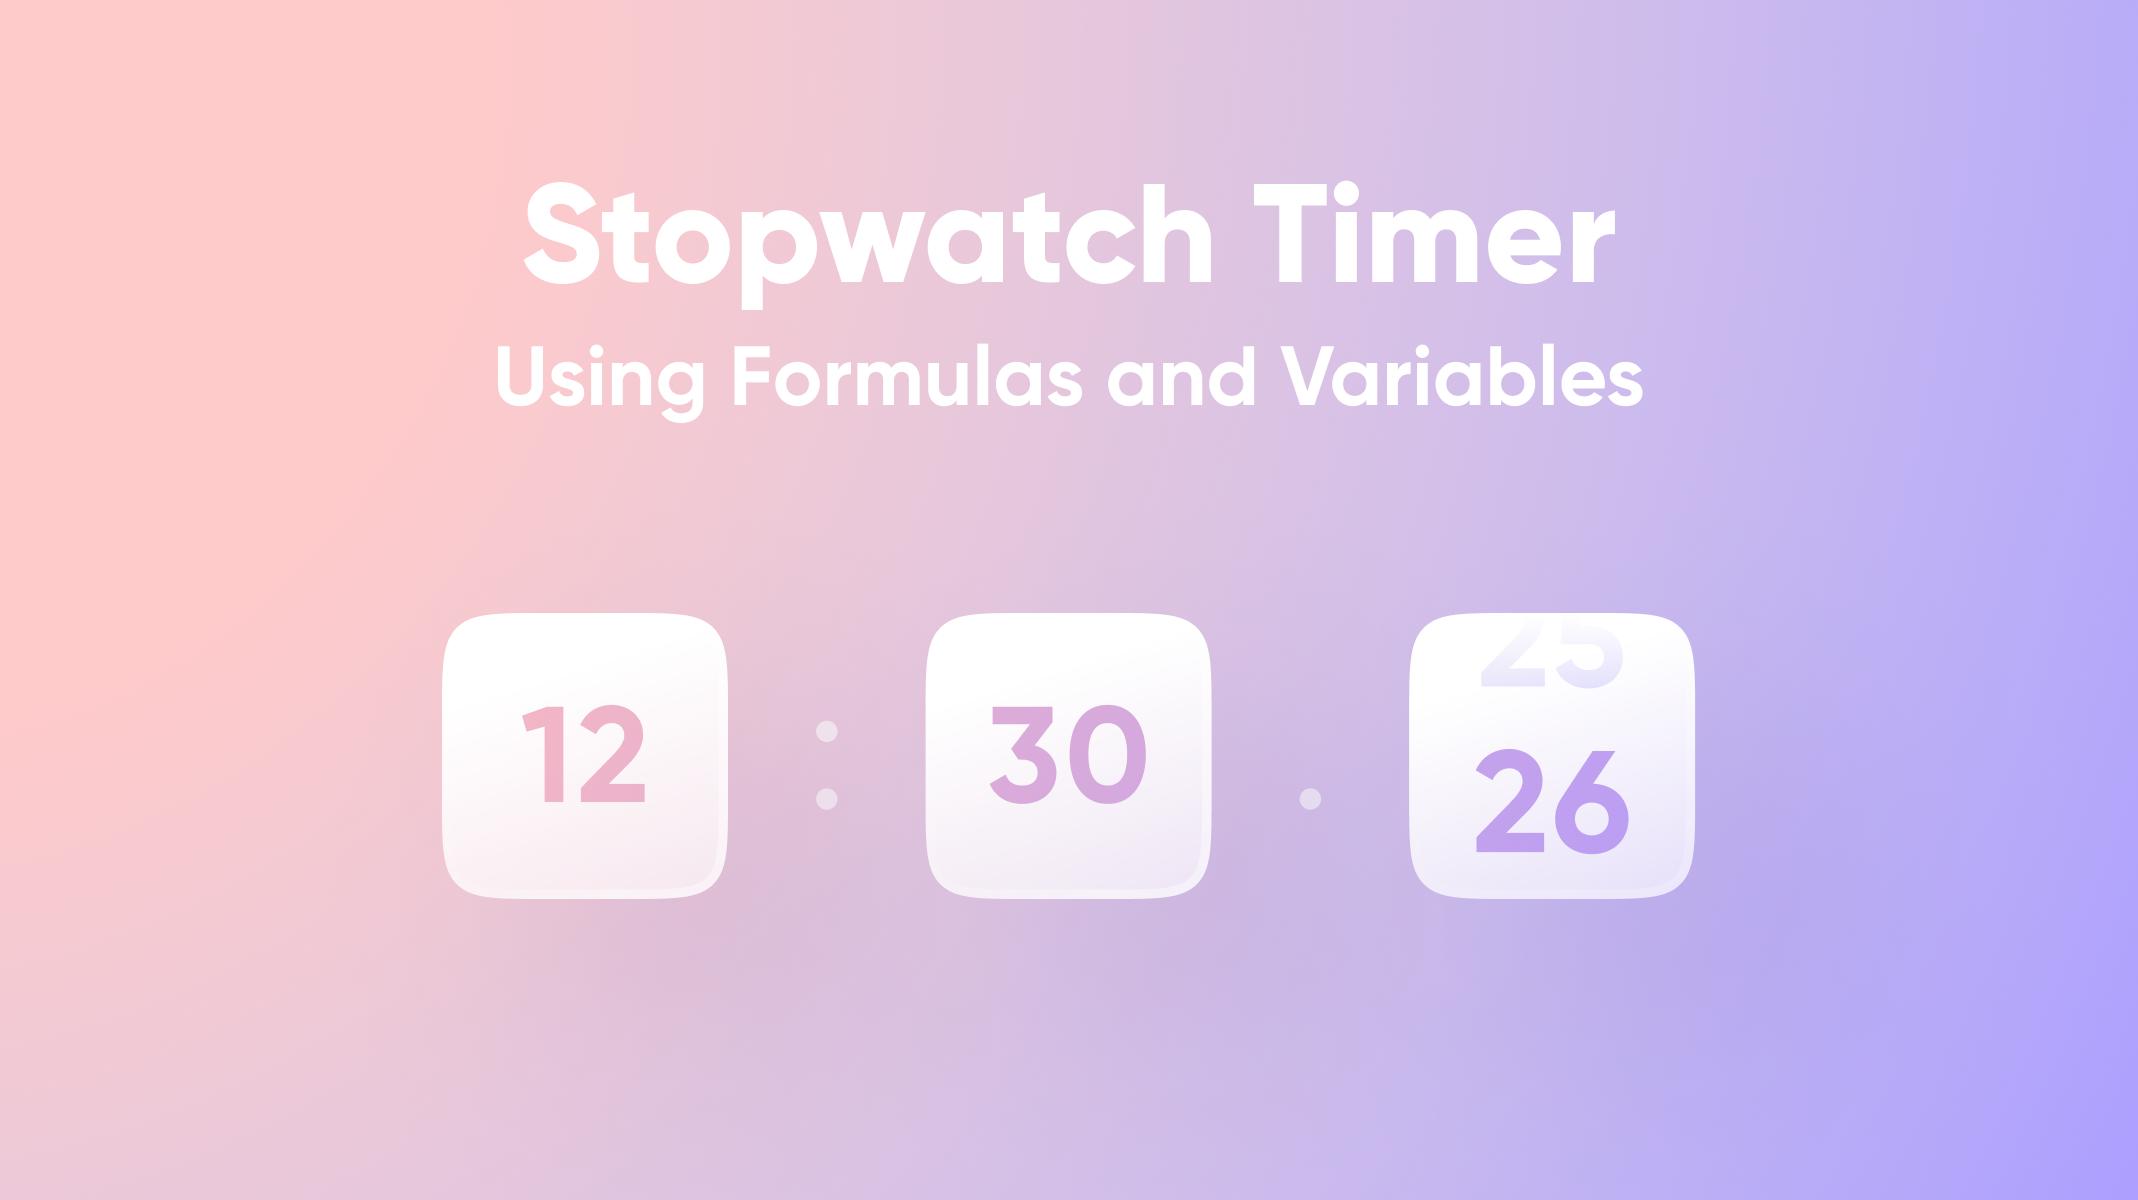 Stopwatch Timer Using Formulas and Variables Thumbnail